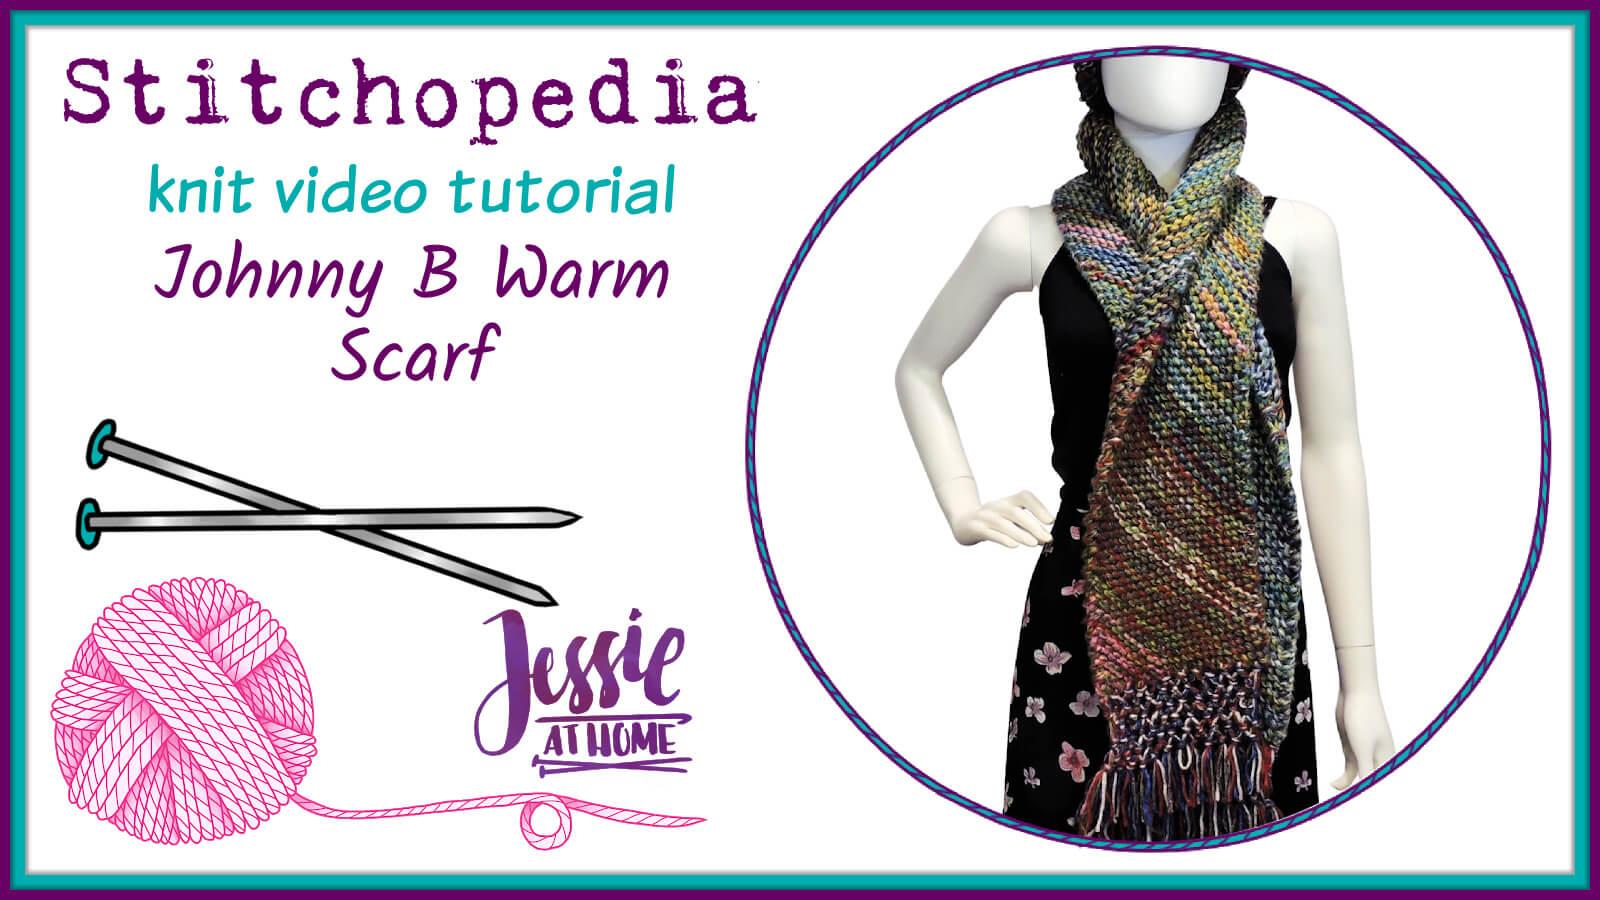 Johnny B Warm Scarf Stitchopedia Knit Video Tutorial - Cover